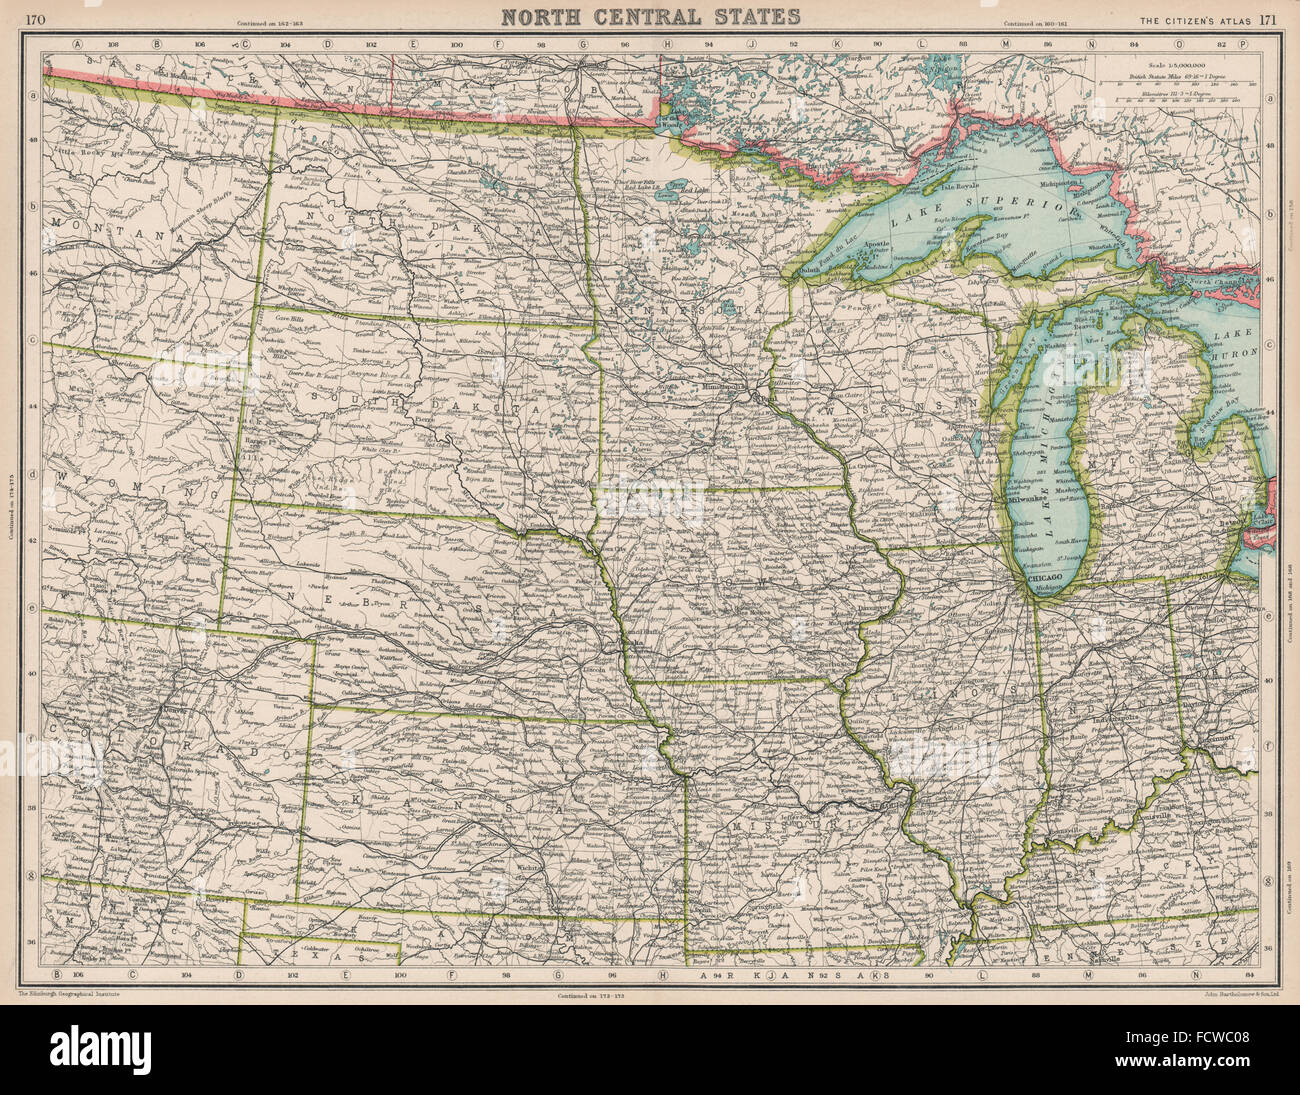 usa midwest nd sd mi wi michigan indiana illinois iowa mi ne  - usa midwest nd sd mi wi michigan indiana illinois iowa mi ne kansas map